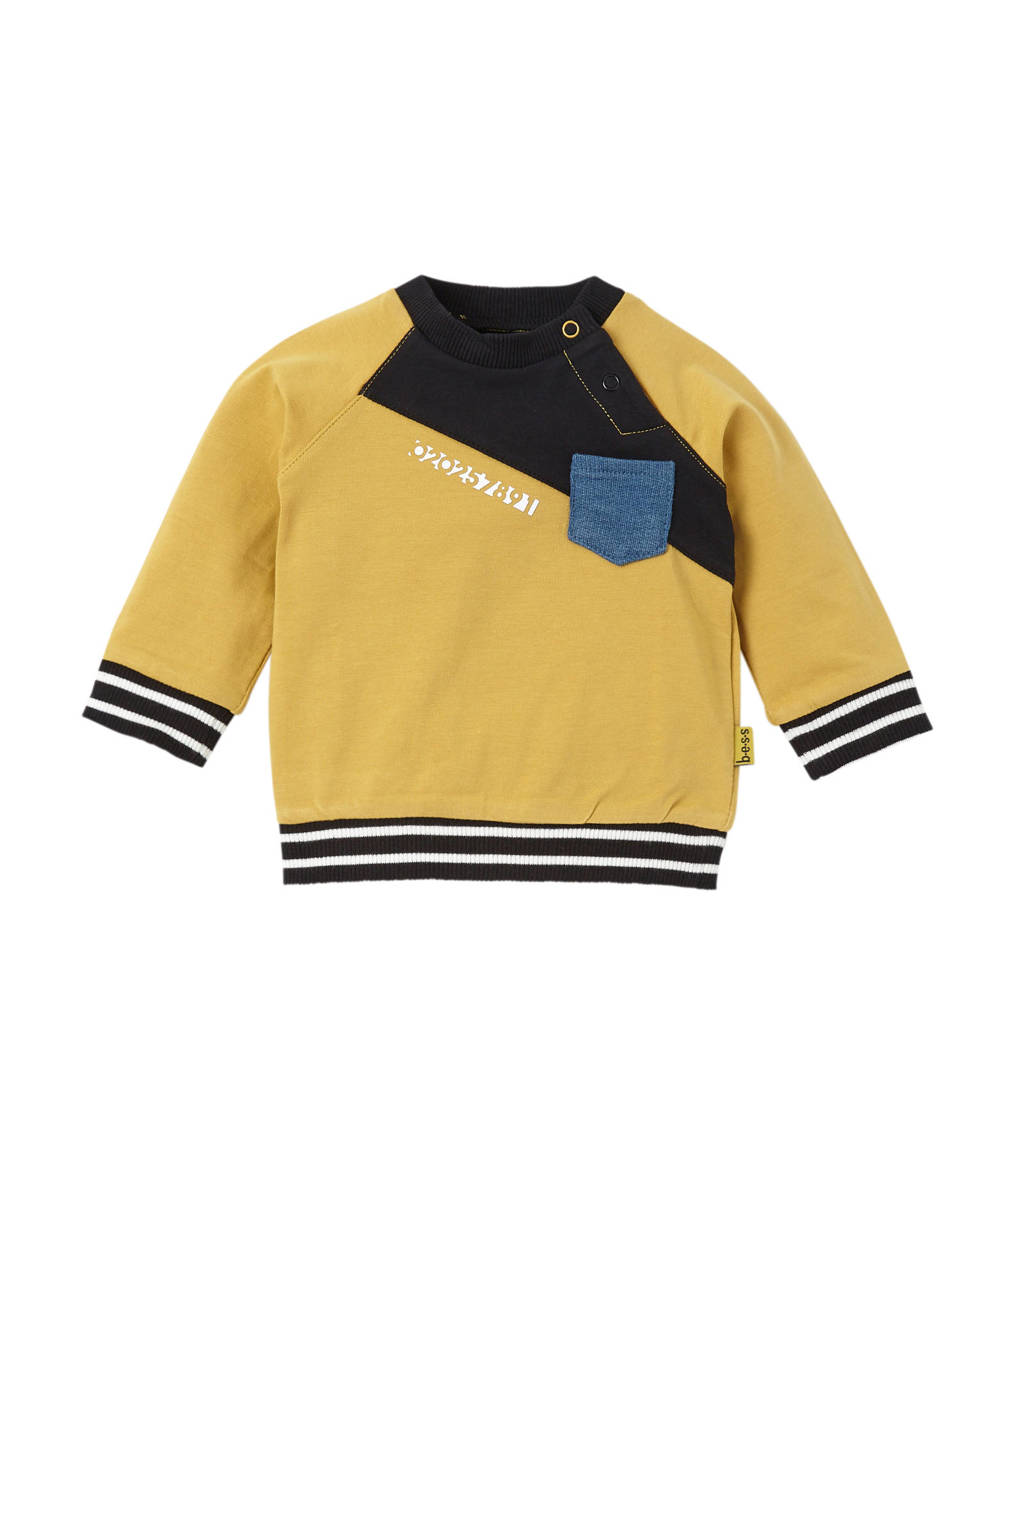 B.E.S.S newborn sweater oker, Oker/zwart